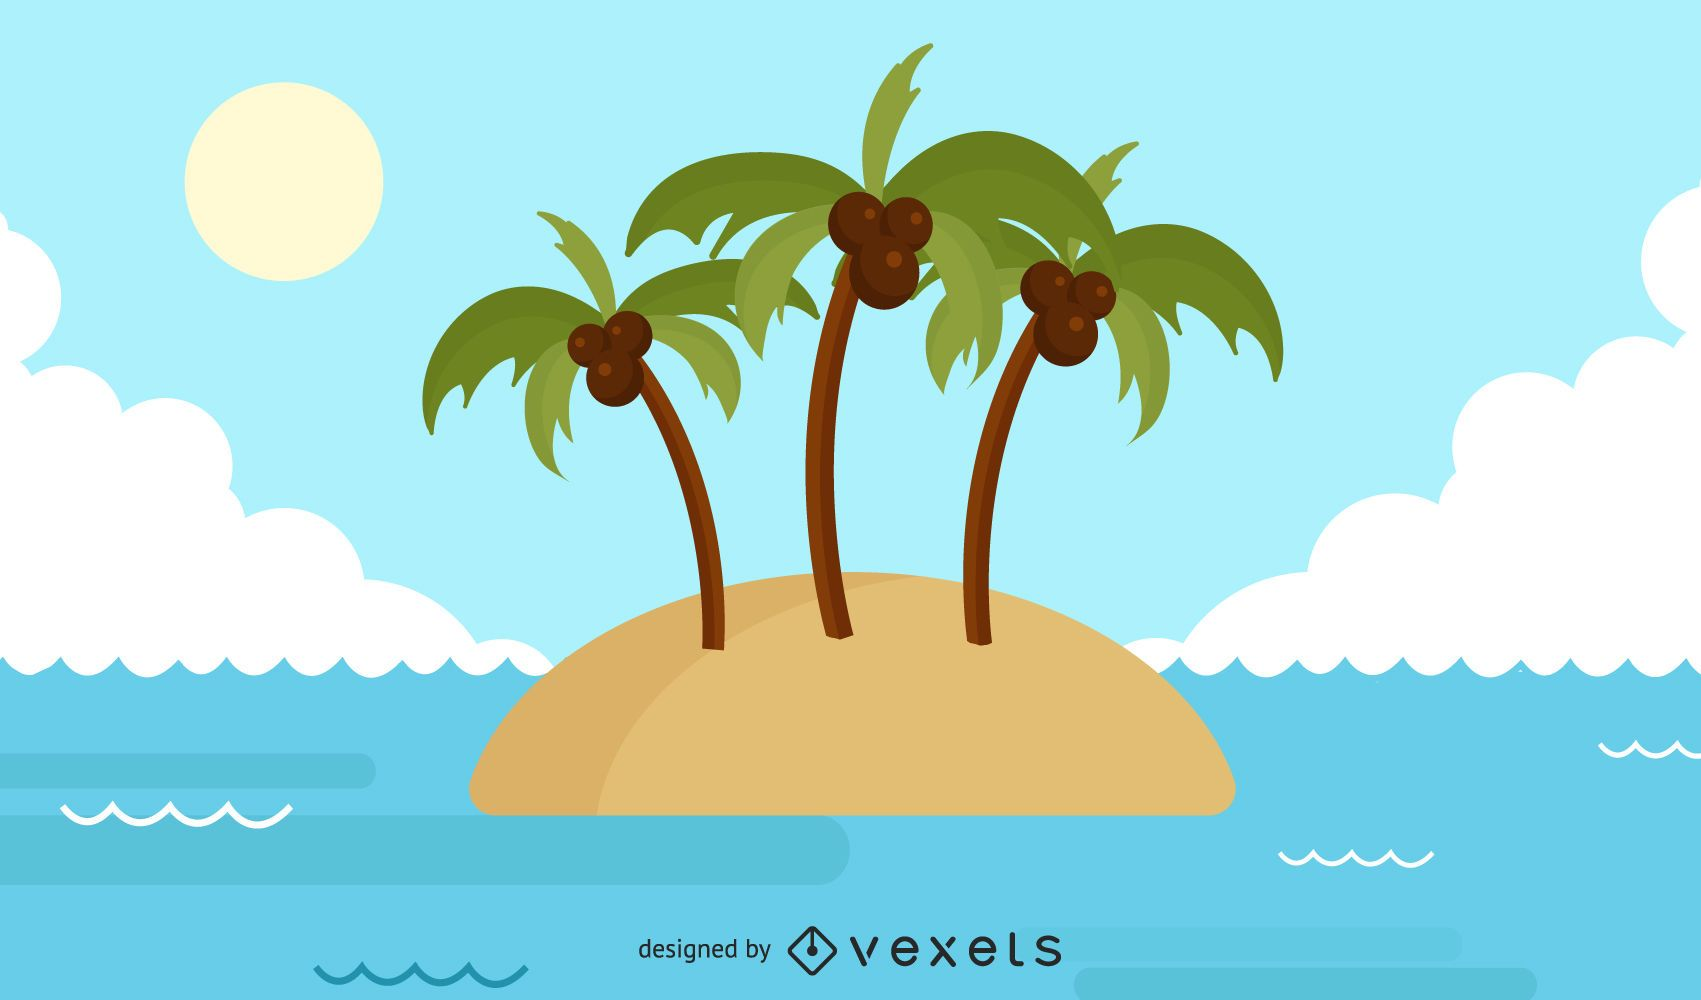 Deserted island illustration design